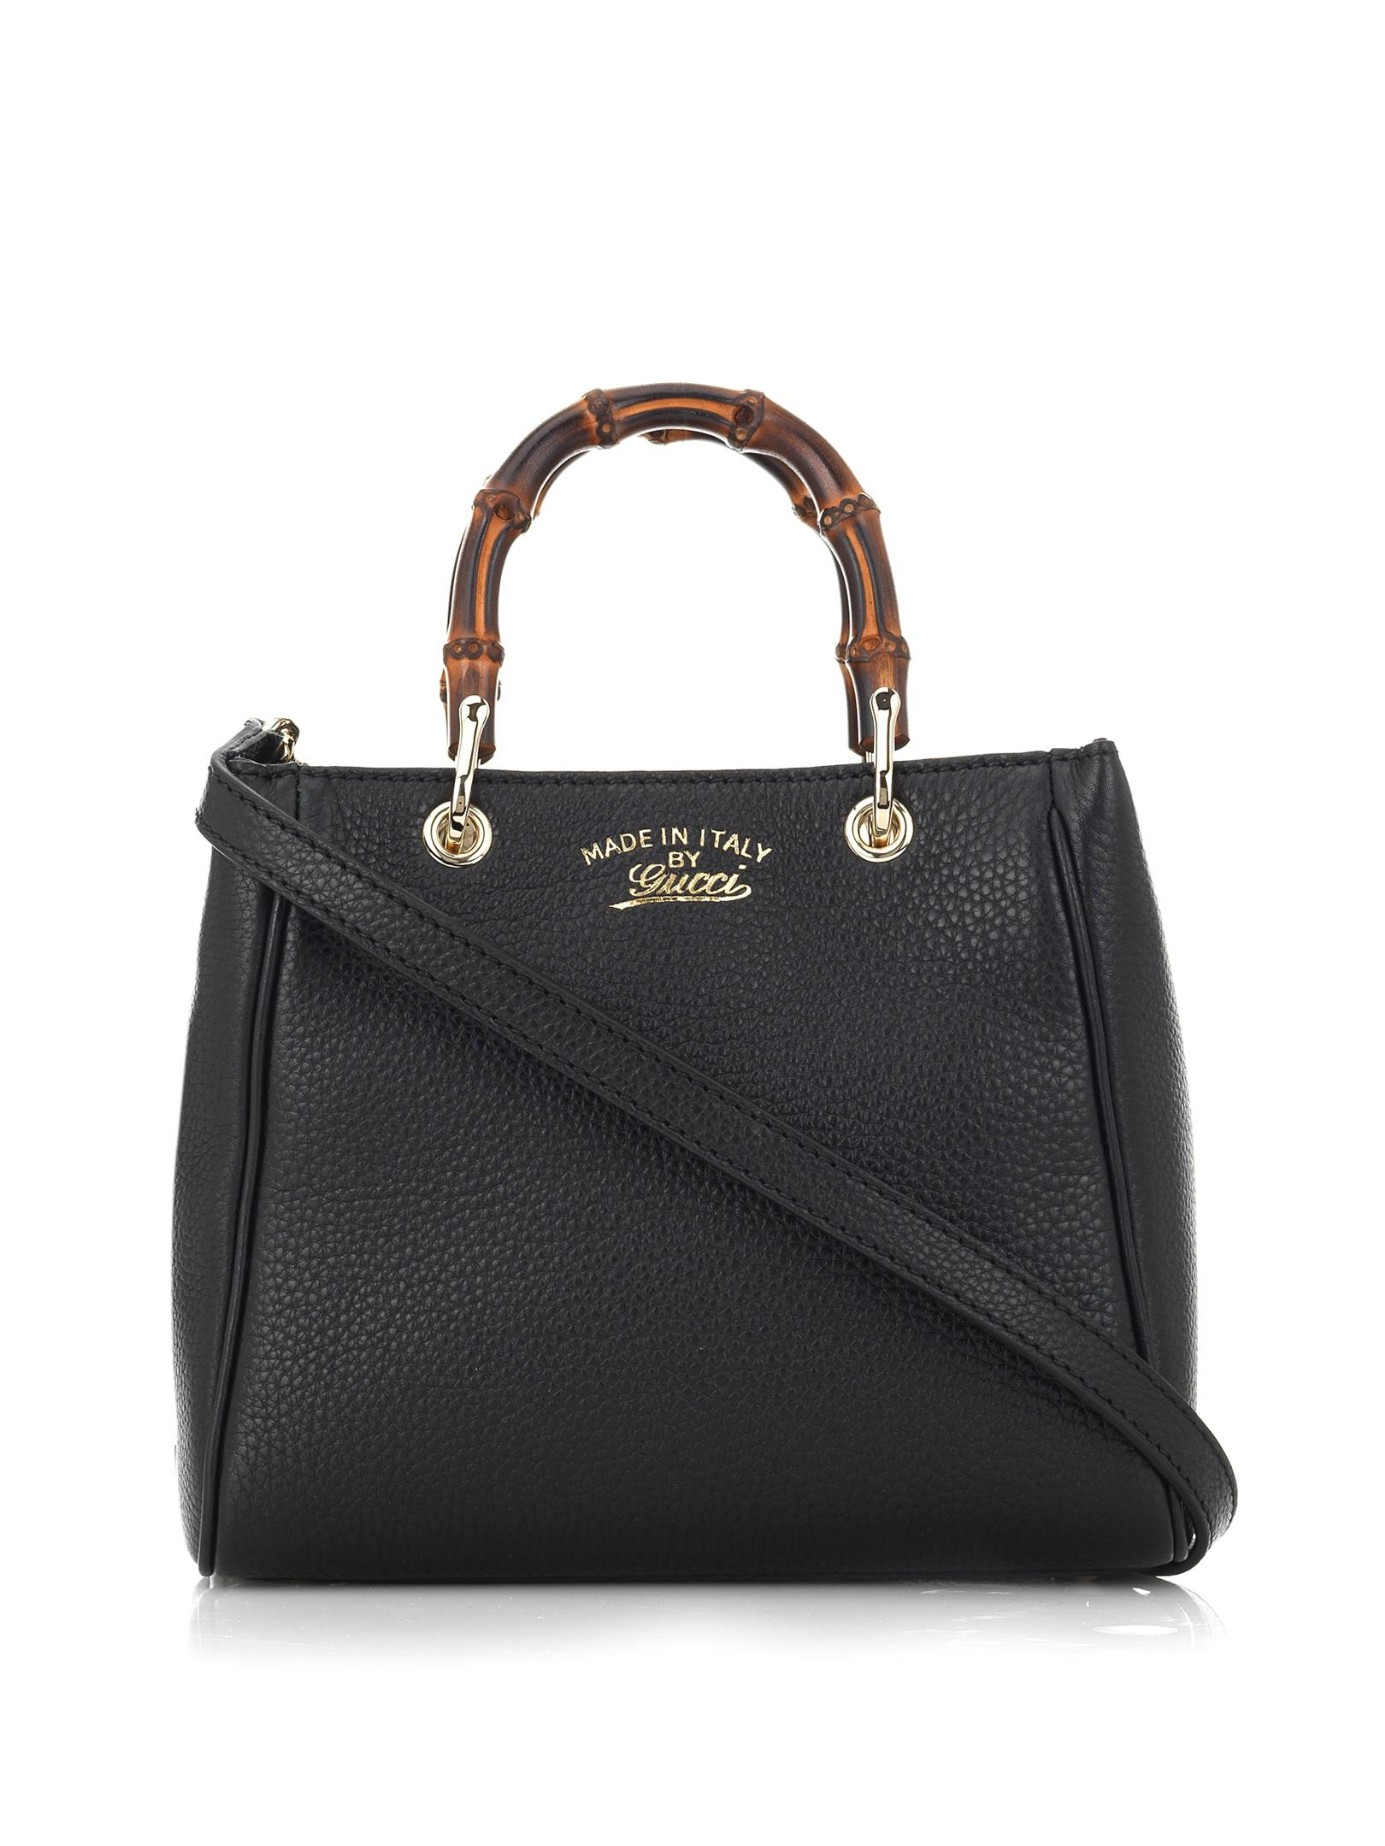 8281b38a2201 Lyst - Gucci Bamboo Mini Leather Cross-body Bag in Black